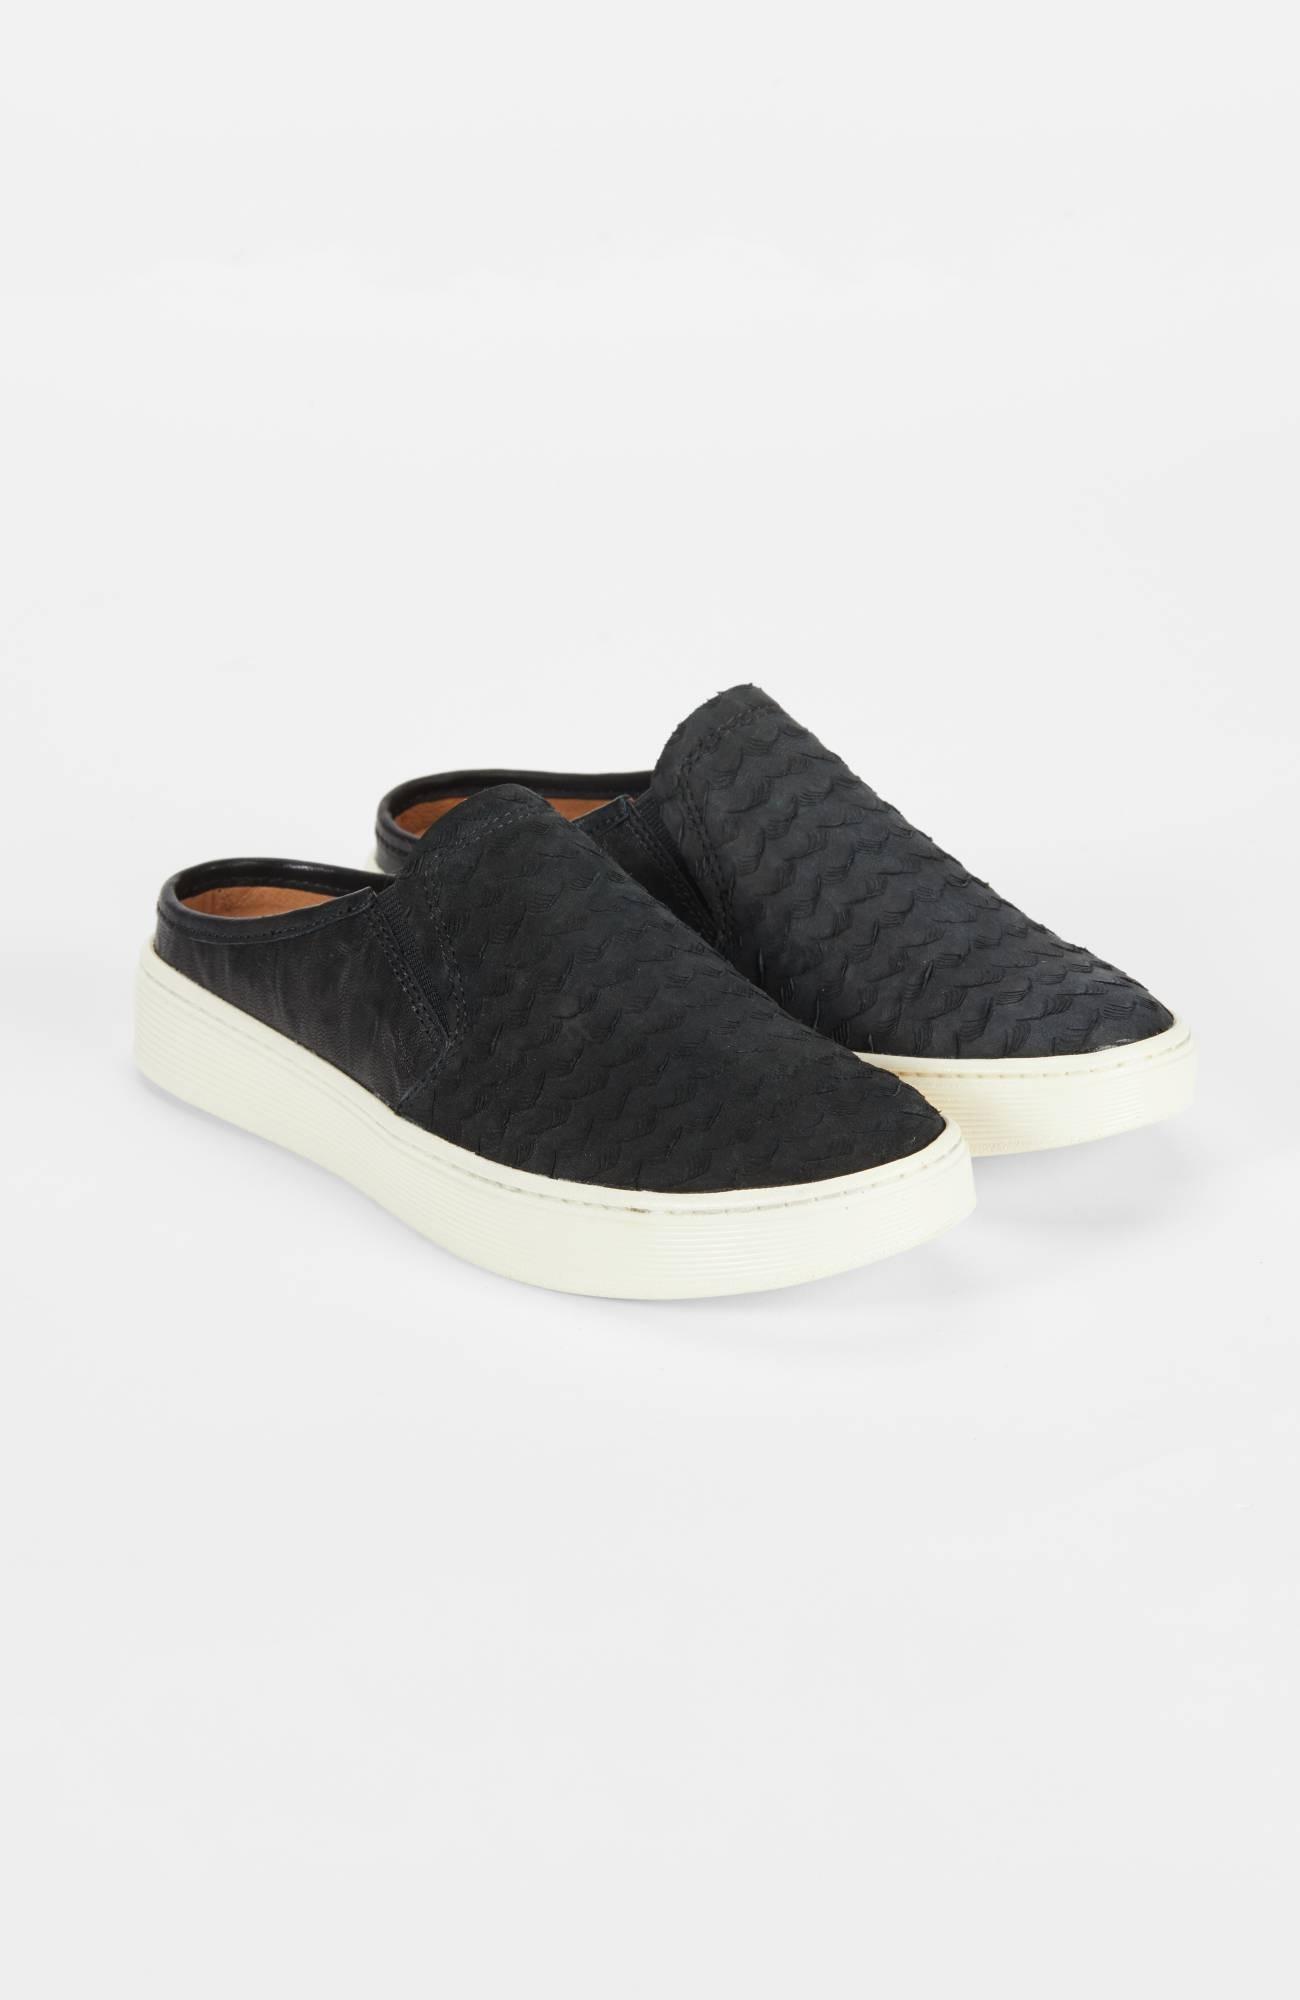 Sofft® Somers III Sneaker Slides | JJill